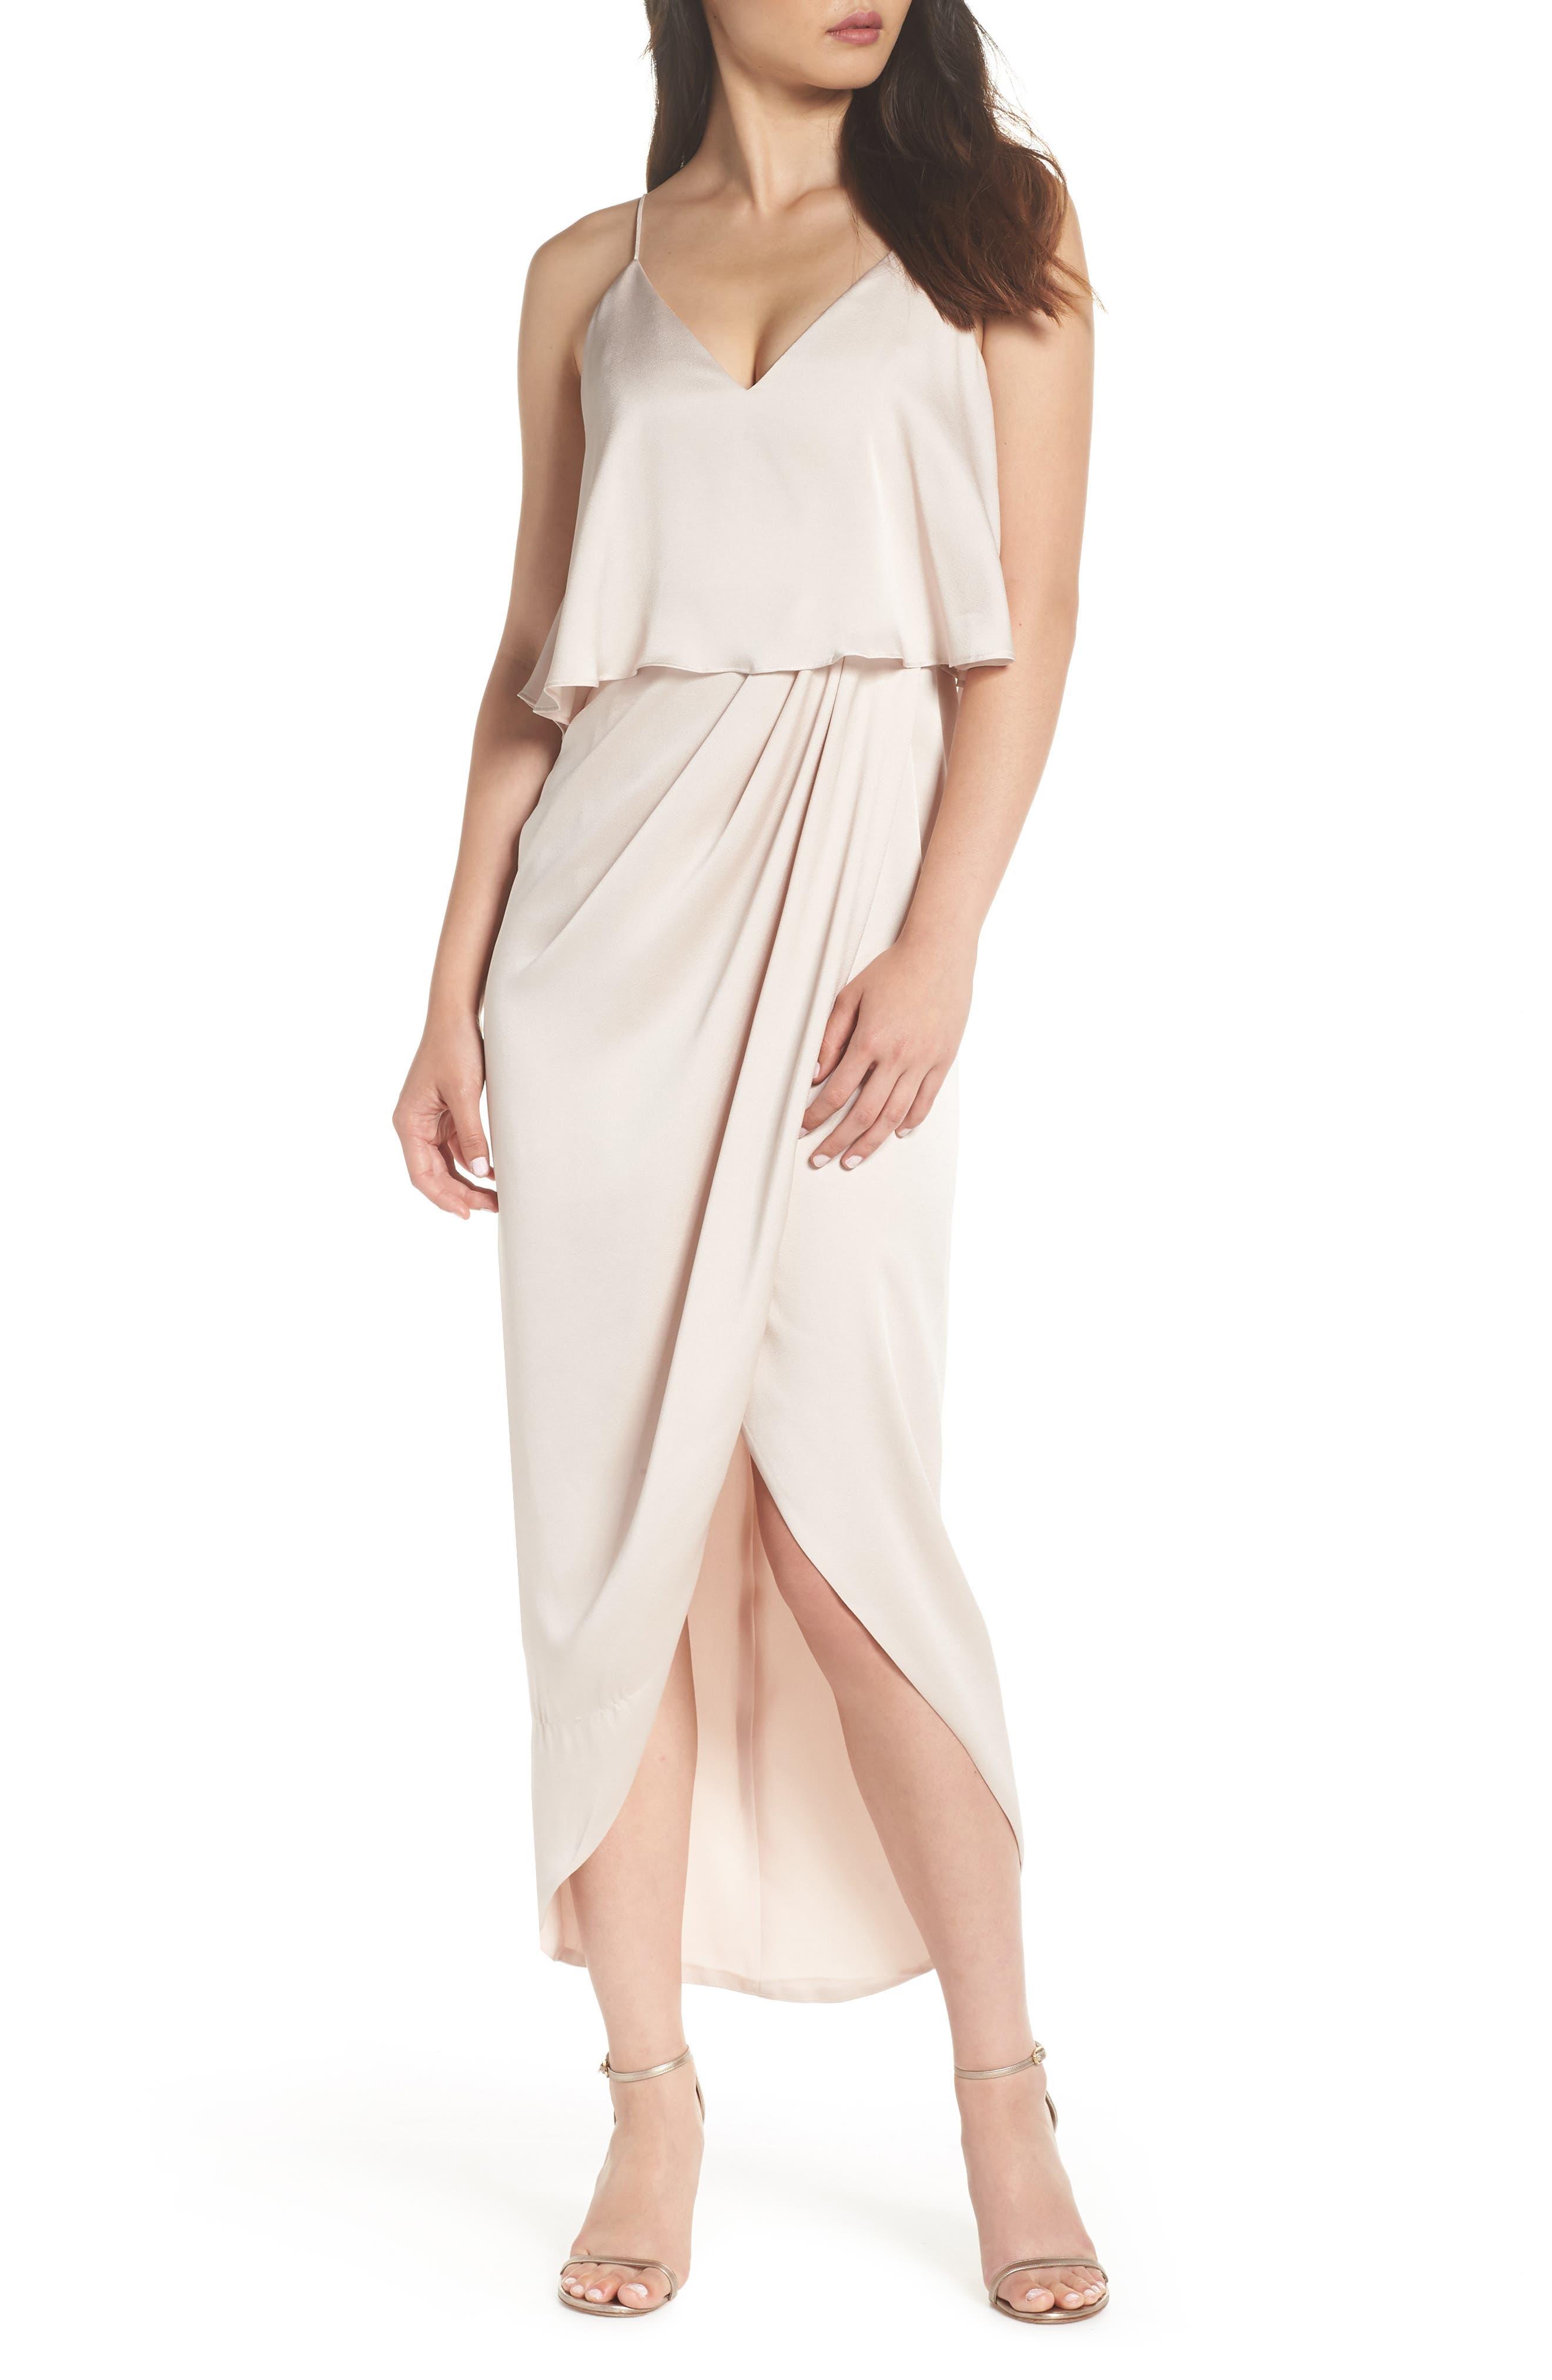 Shona Joy Luxe Frill Tulip Hem Maxi Dress, Beige